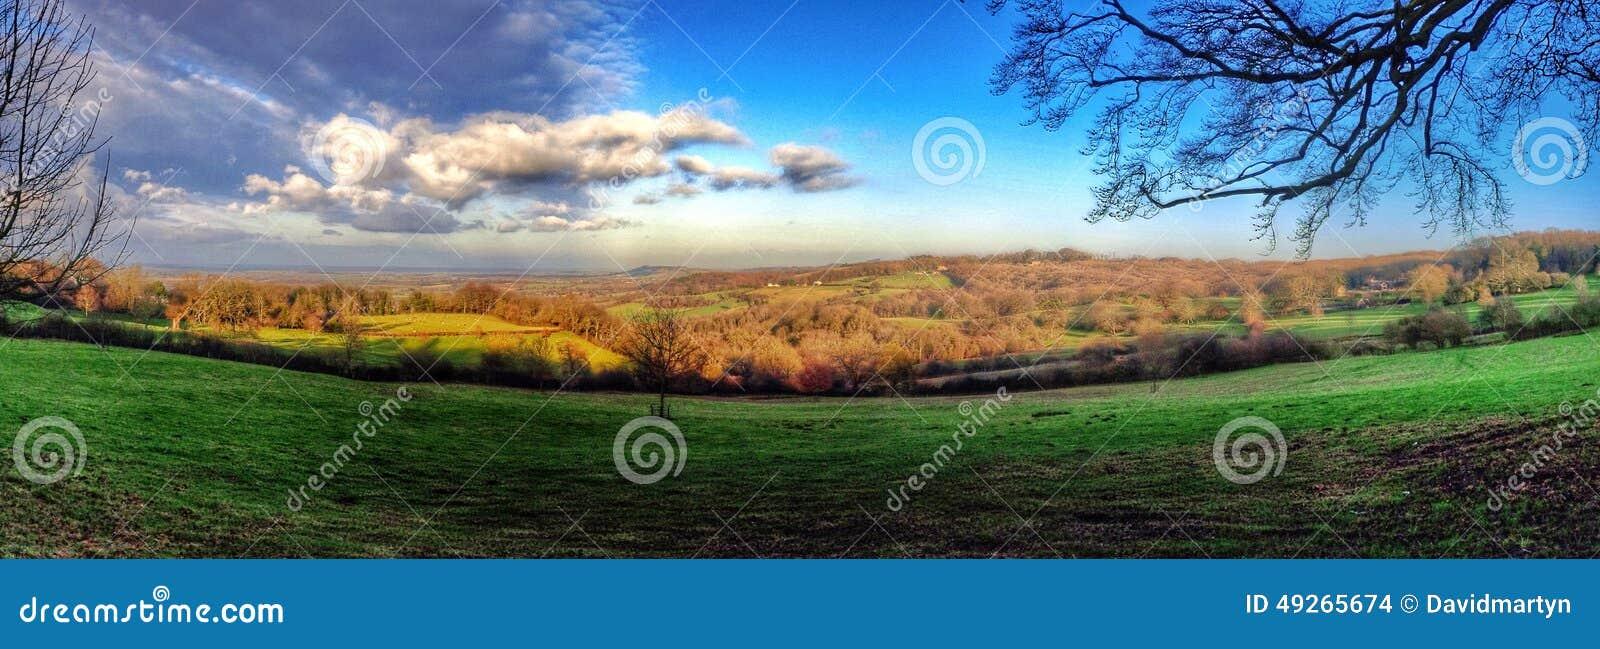 Field Stock Photo - Image: 49265674